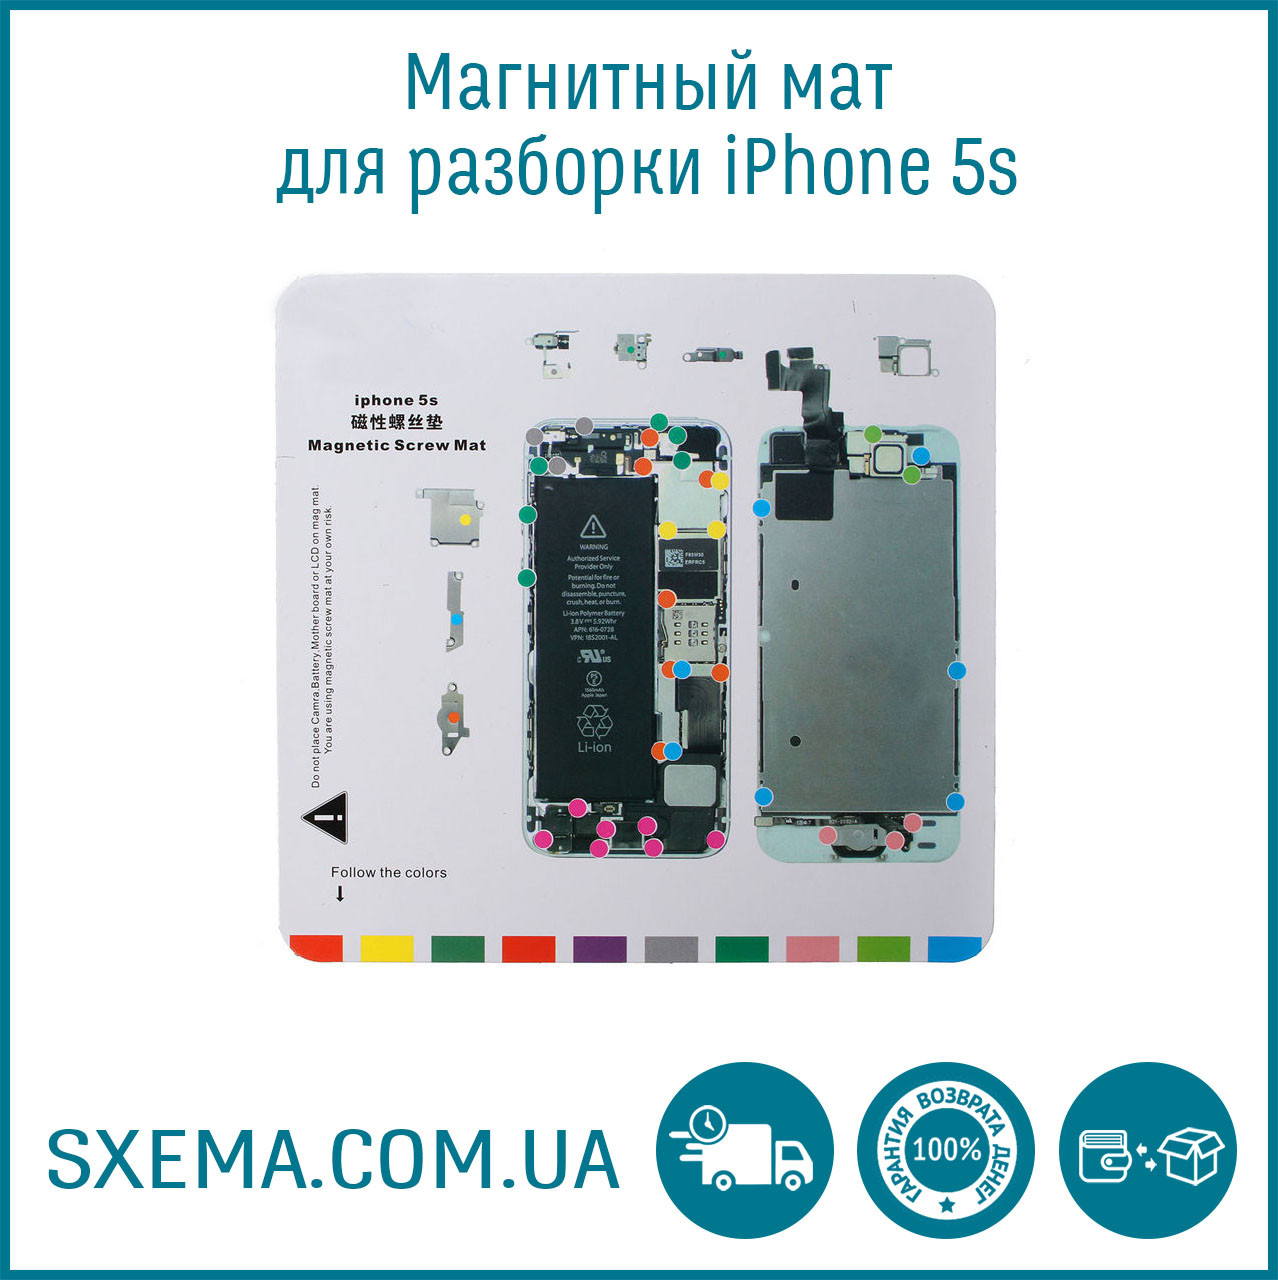 Магнитный мат для разборки IPhone 5S (190x200мм)